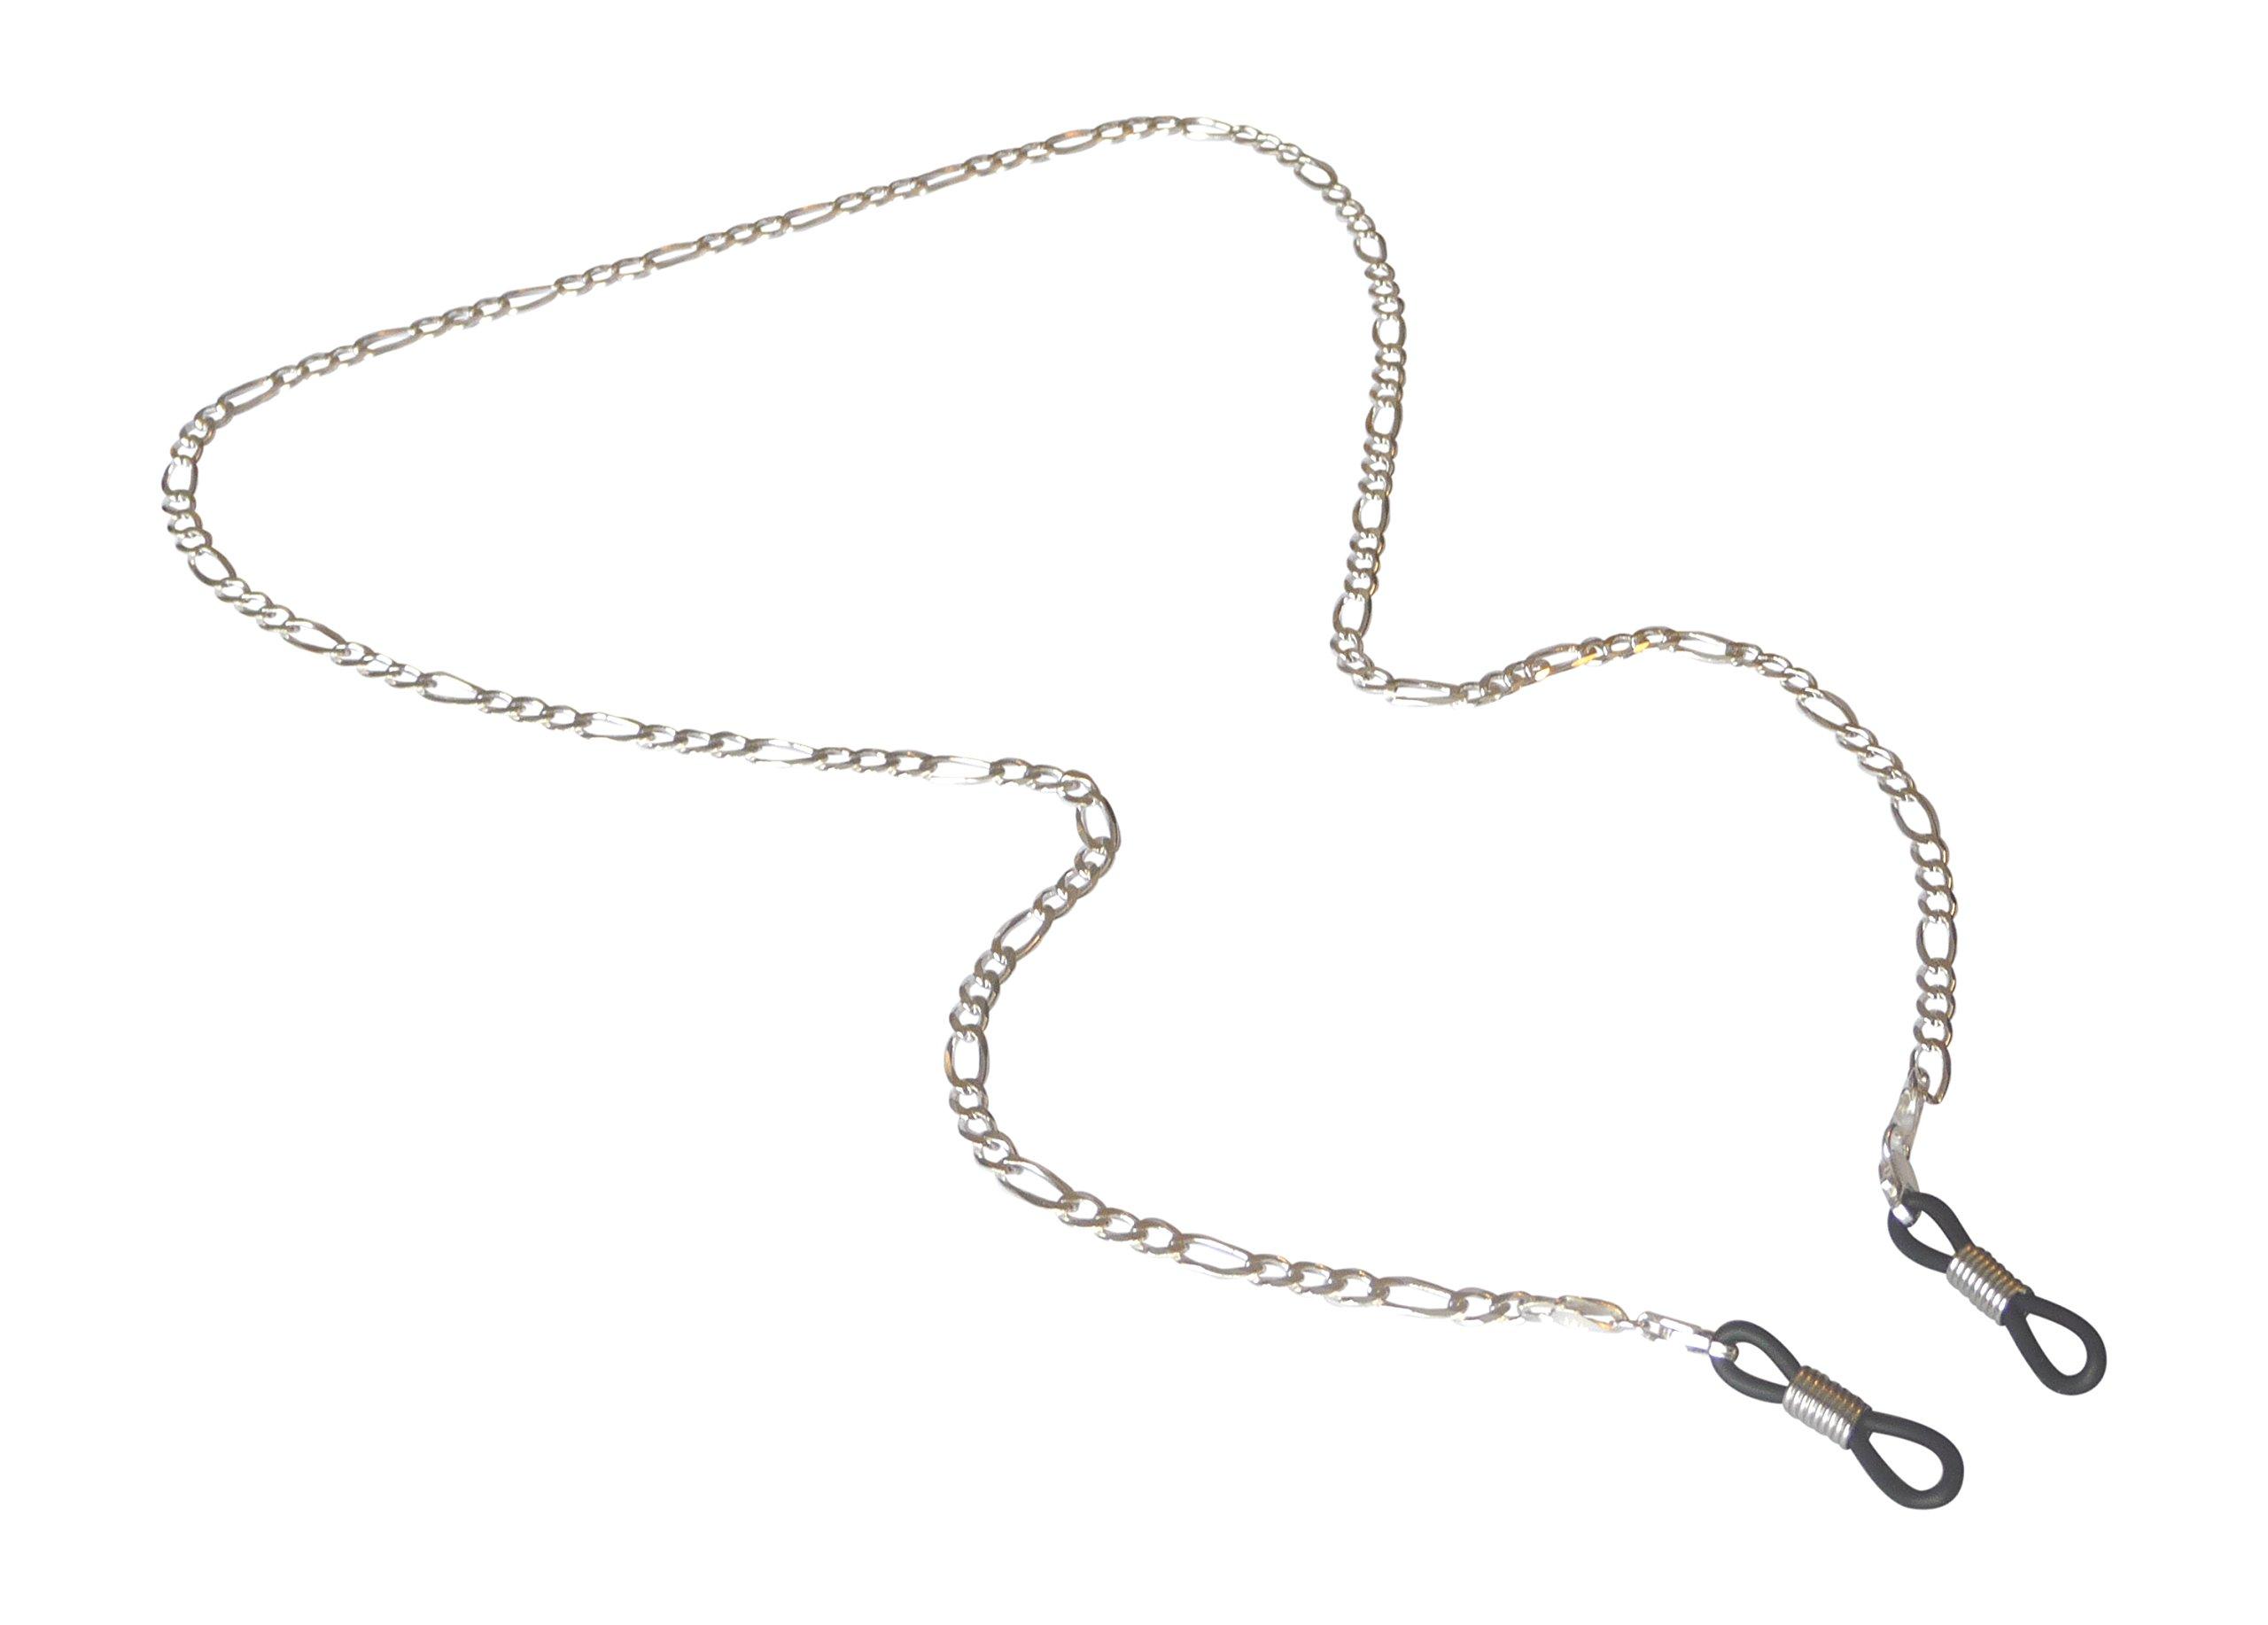 Silver Eyeglass Chain for Glasses, Sterling Silver Eyeglass Holder for Men and Women (3mm) by puntarocks